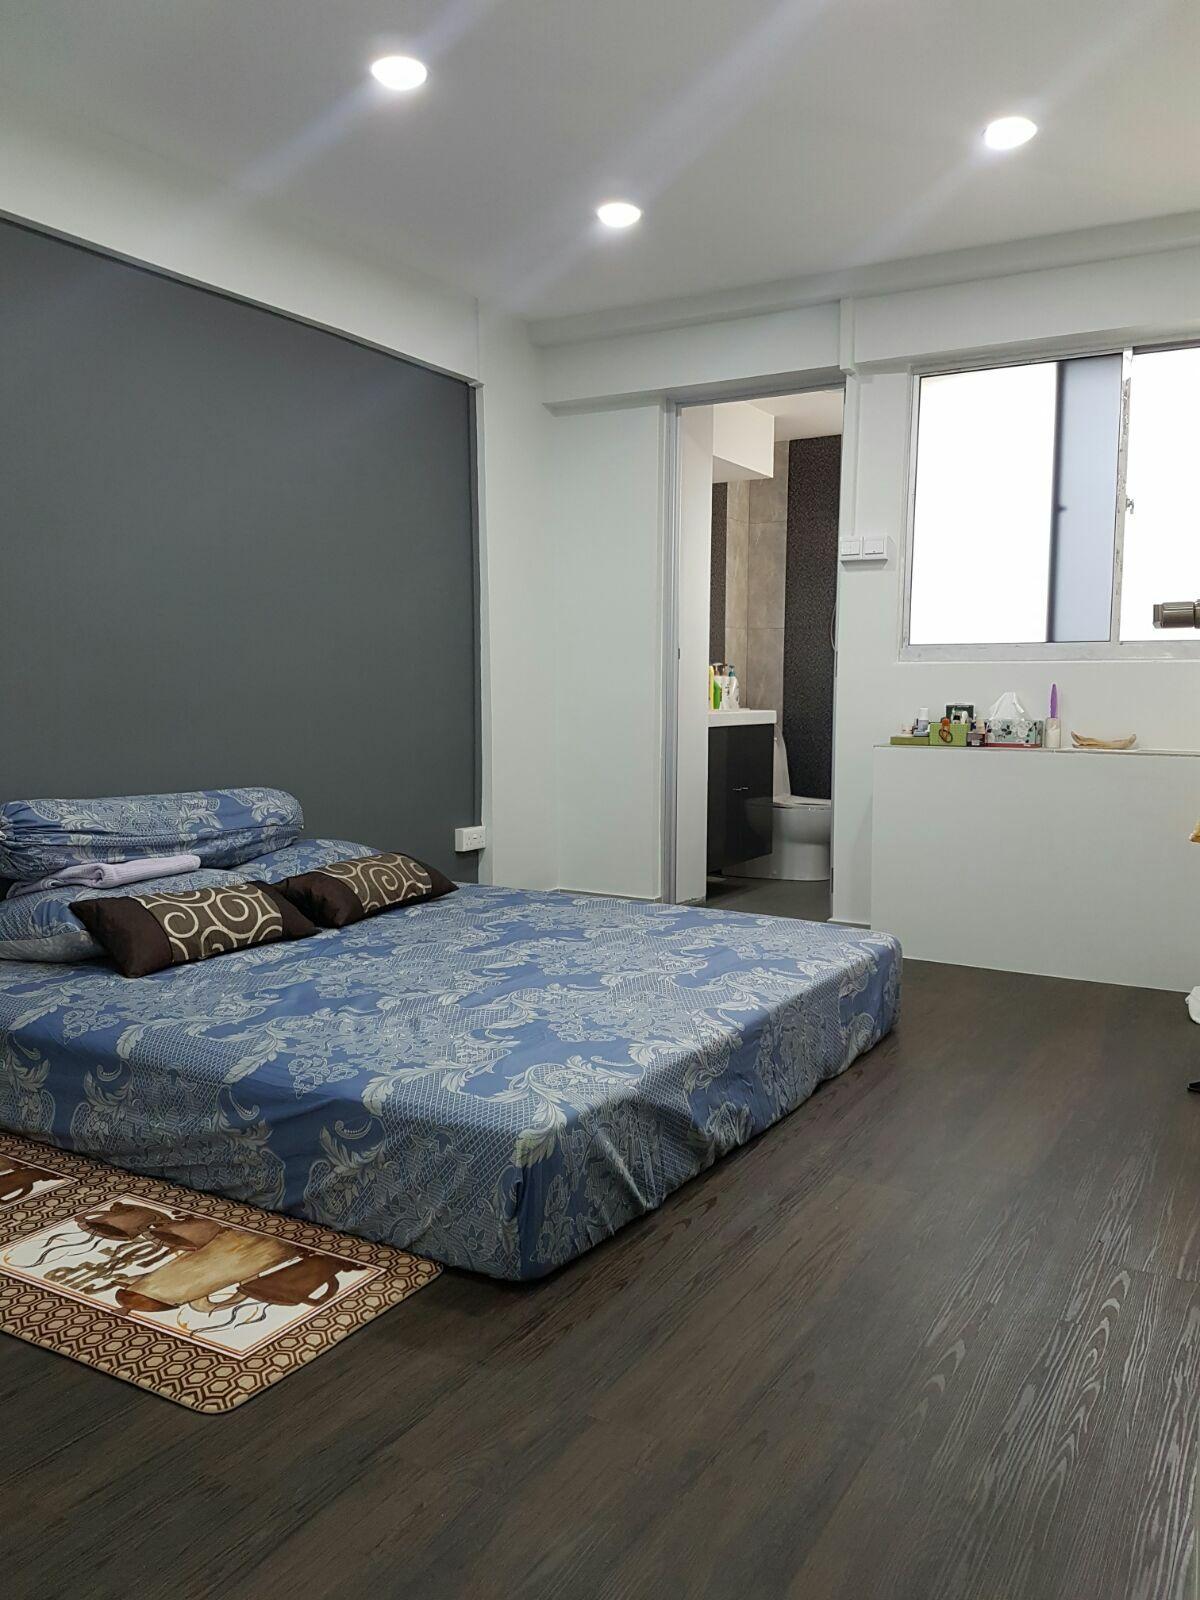 265 Yishun Street 22 265 Yishun Street 22 3 Bedrooms 84 Sqft Hdb Flats For Rent By Khoo